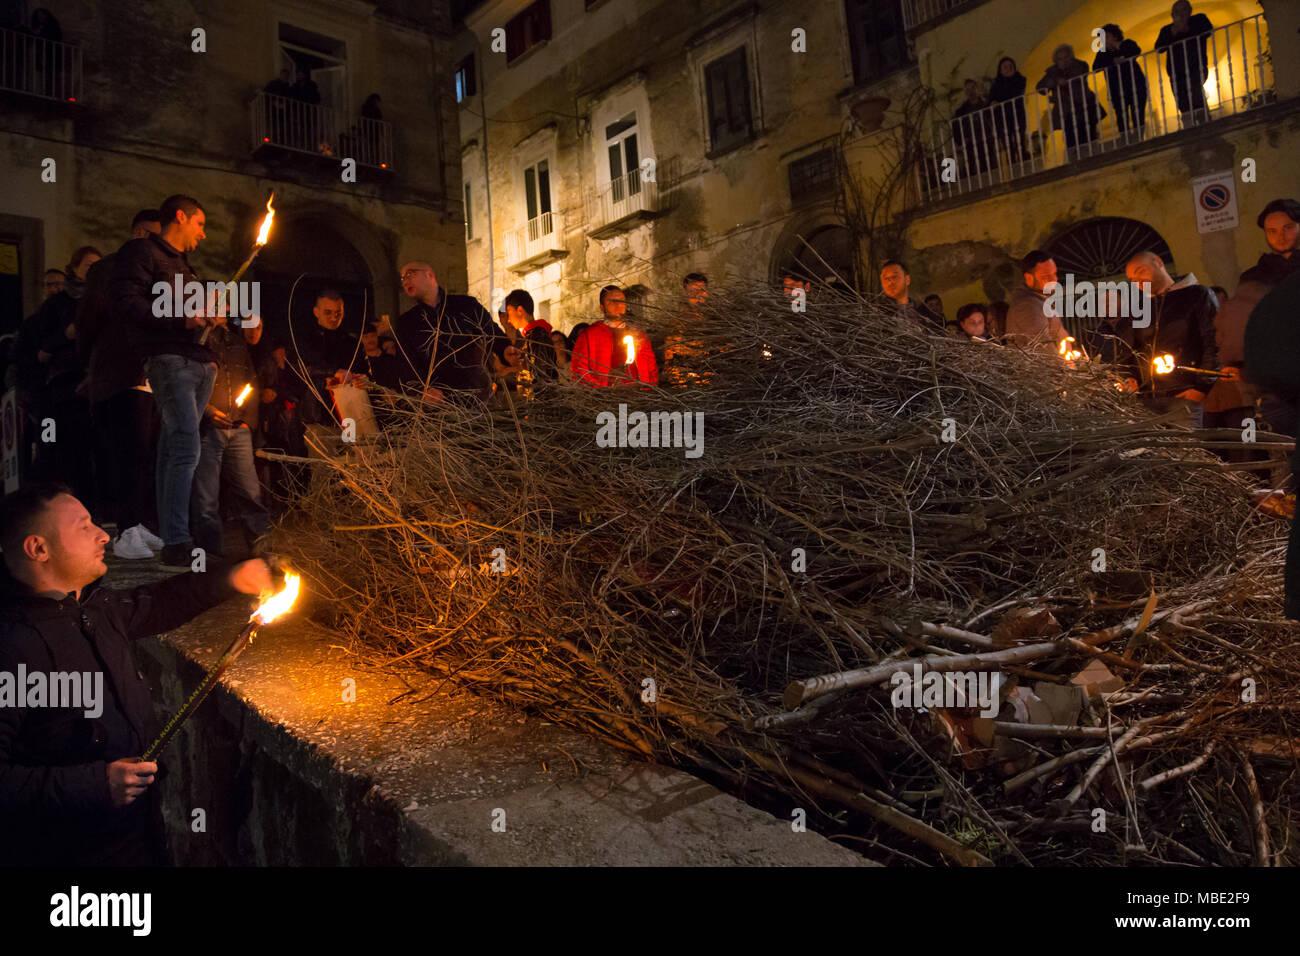 SESSA AURUNCA, ITALY - MARCH 30, 2018 - On Easter Good Friday, at sunset, during the parade of black hoods, men light bonfires on street corners - Stock Image